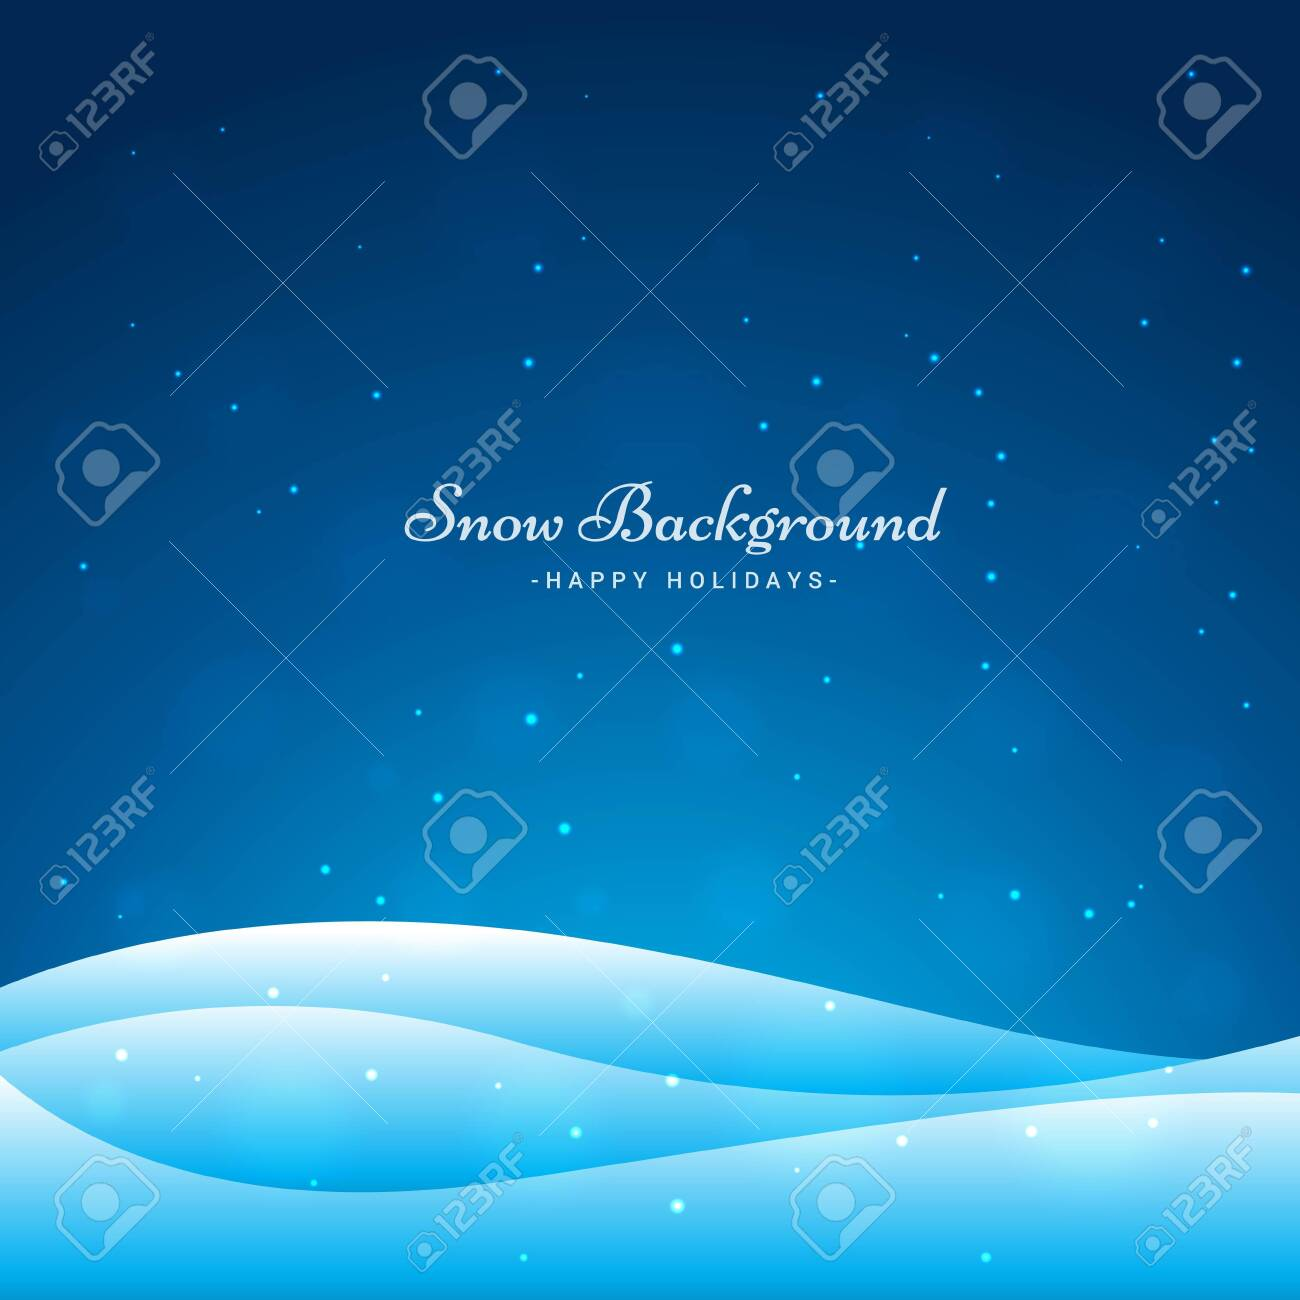 snow wave background vector illustration - 149698450